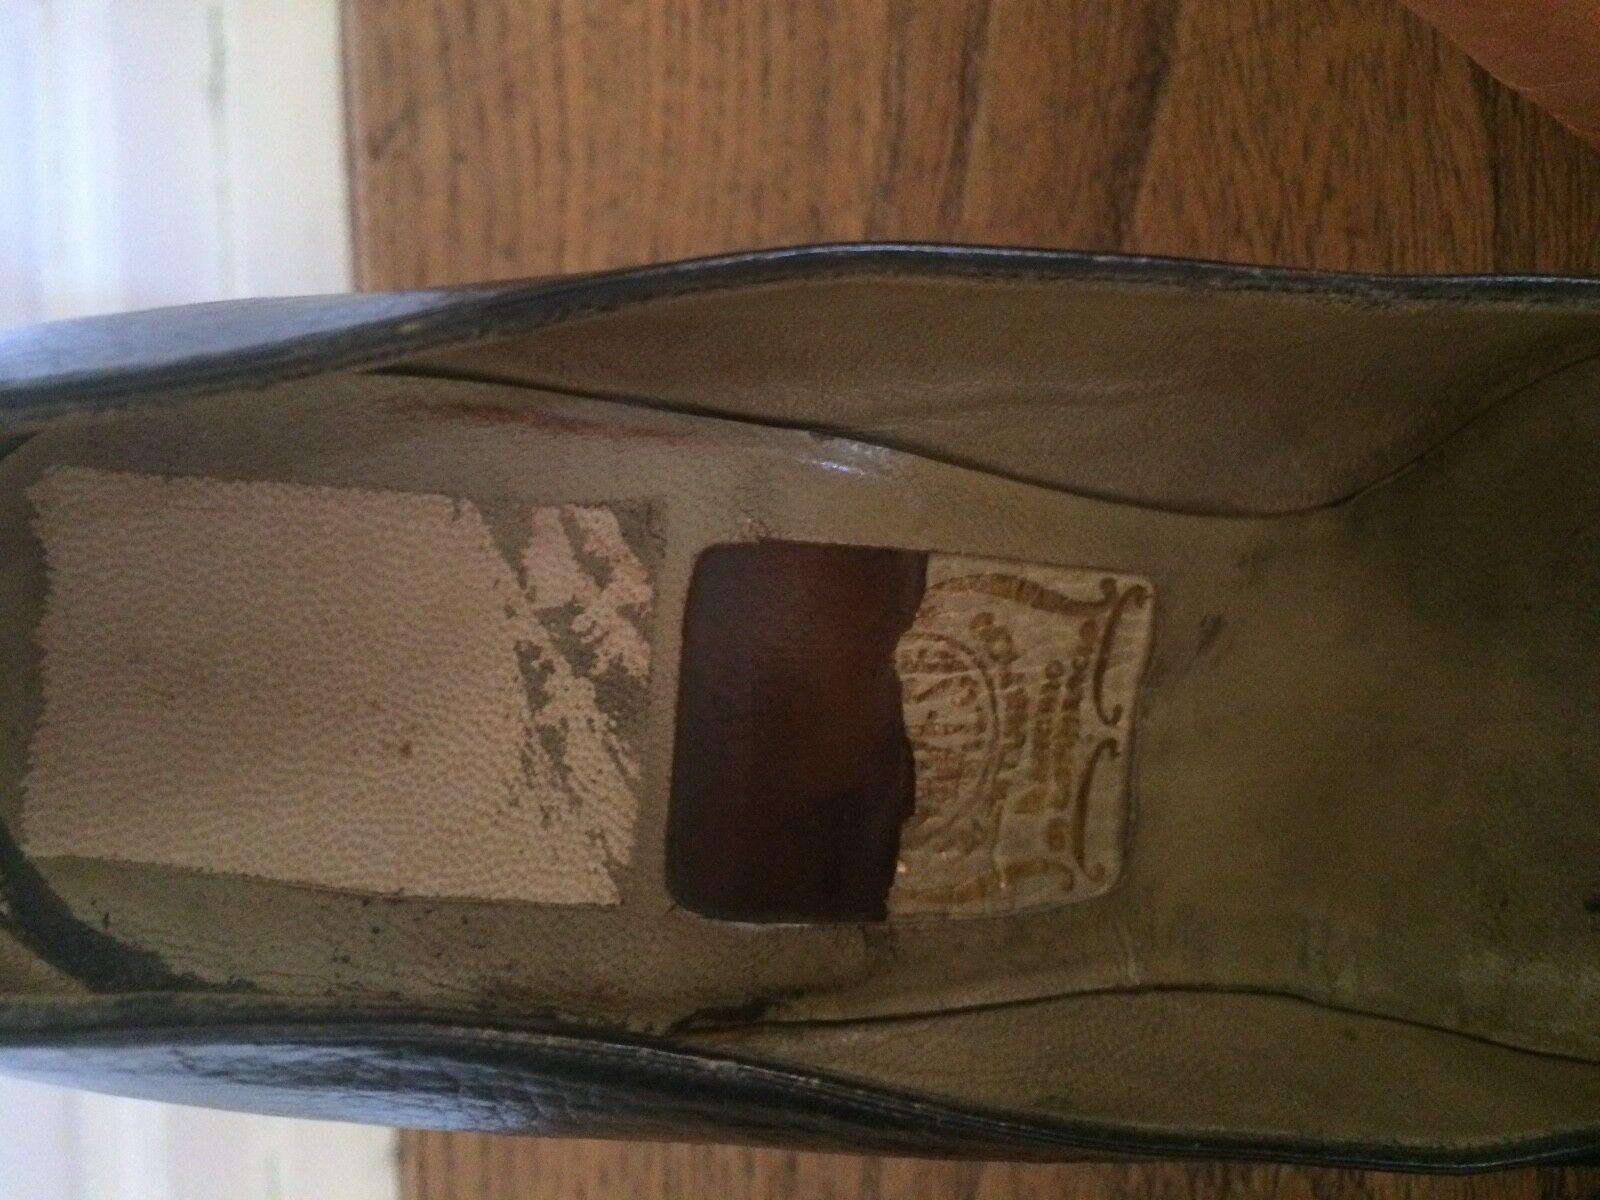 Descuento de liquidación Lot des 5 paires de chaussures rétro